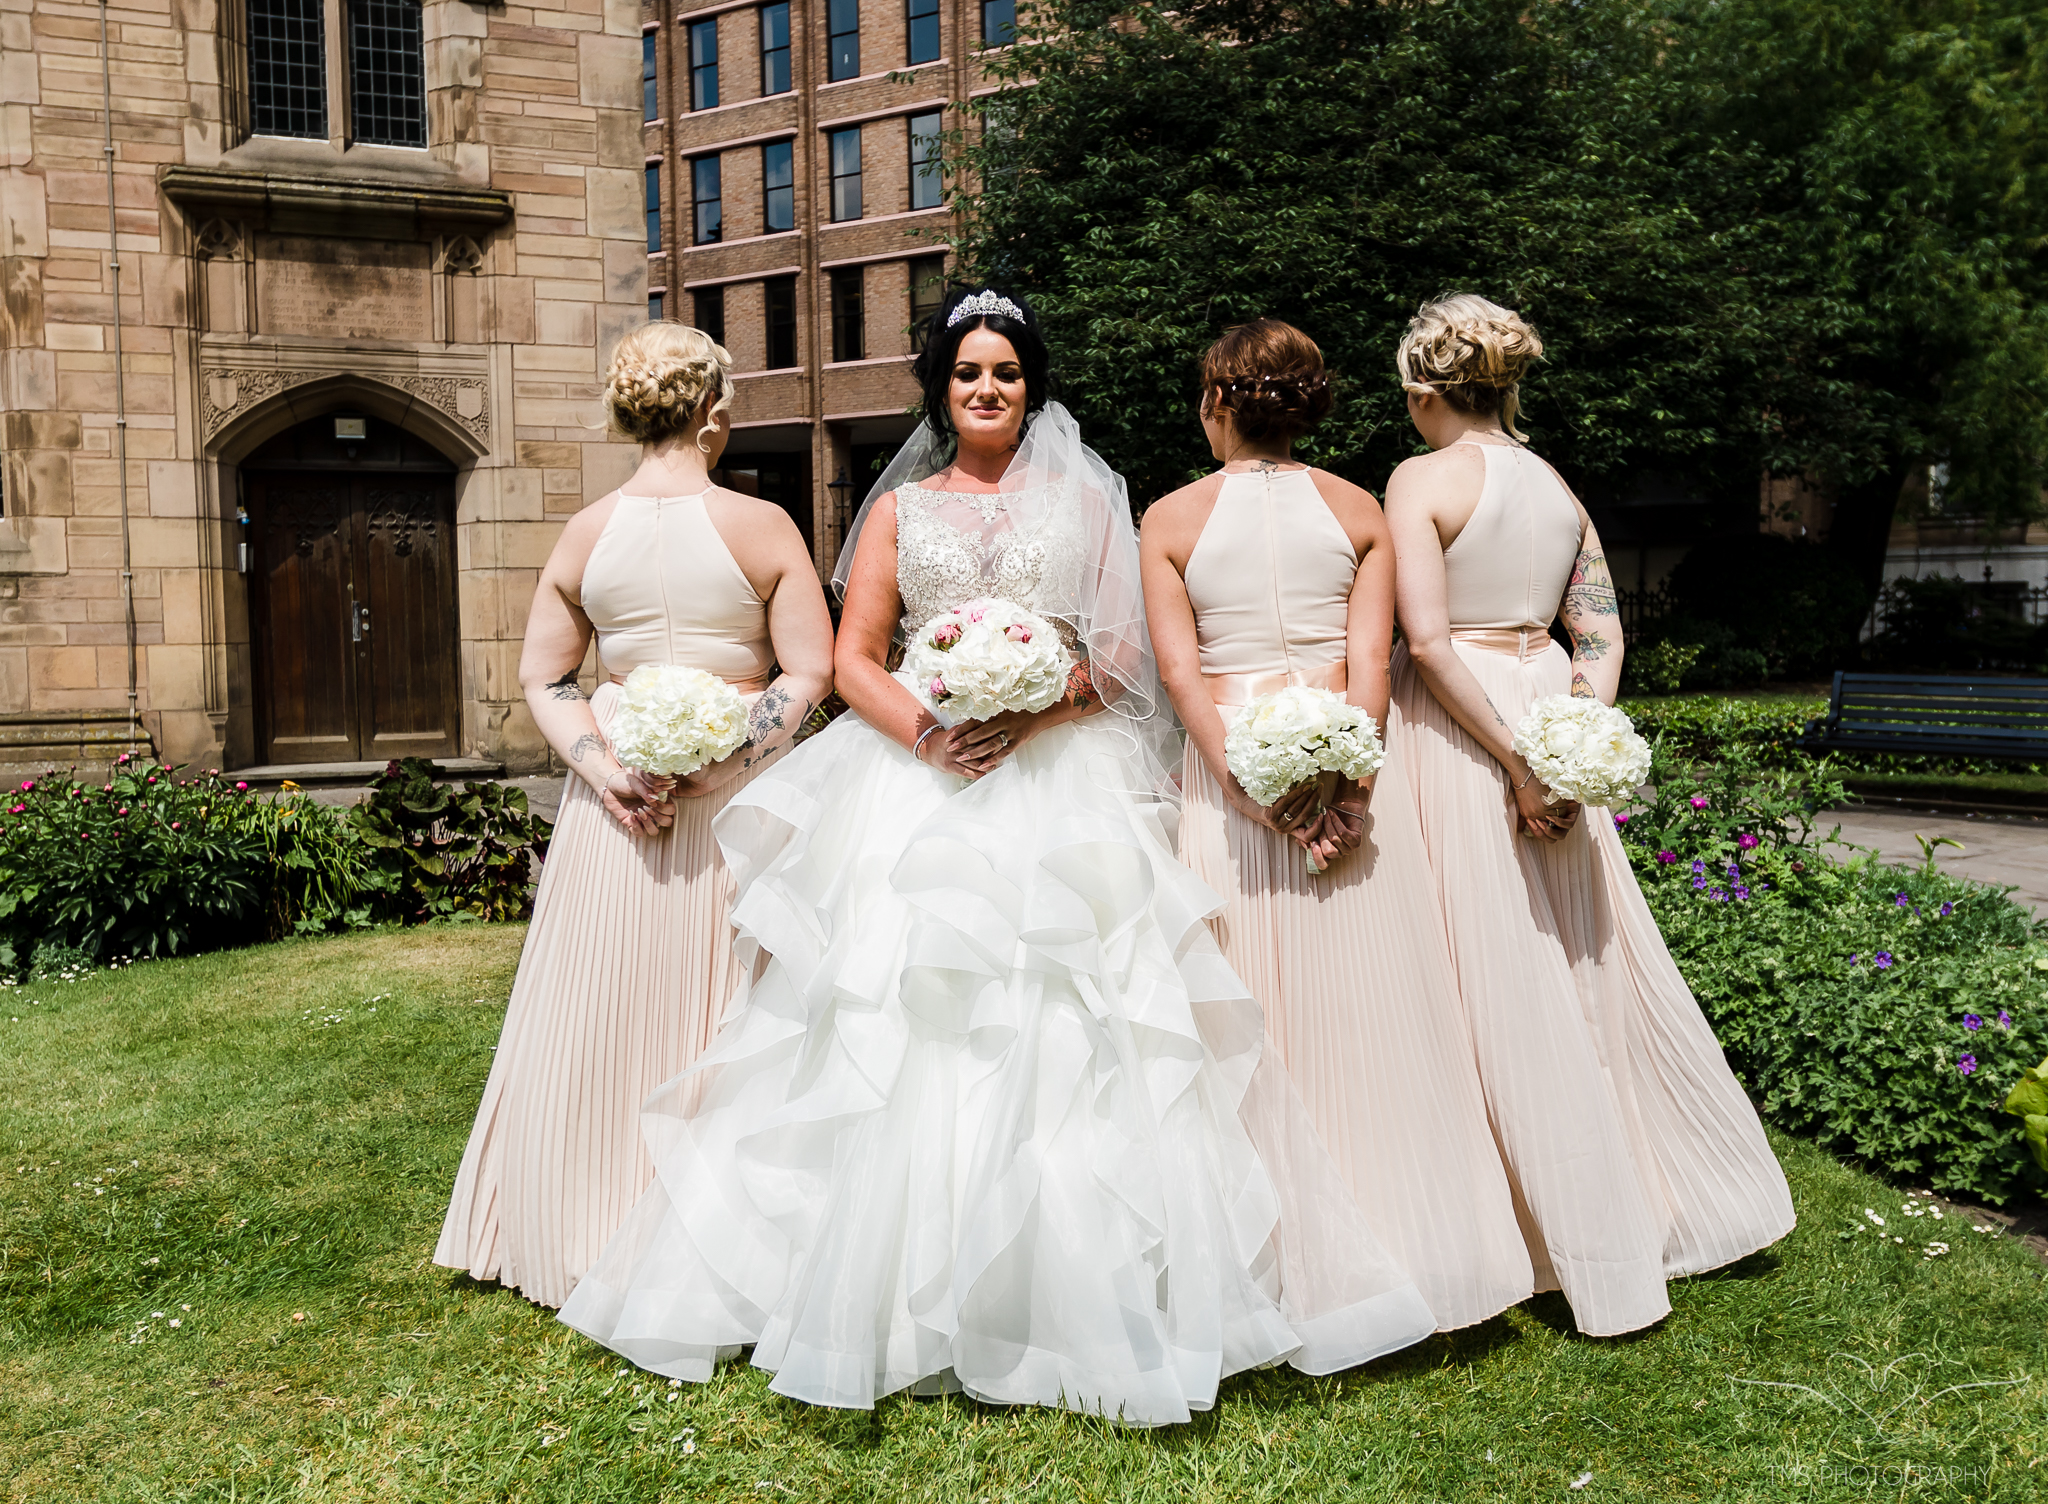 Wedding_photography_Hilton_liverpool_Albertdocks-97